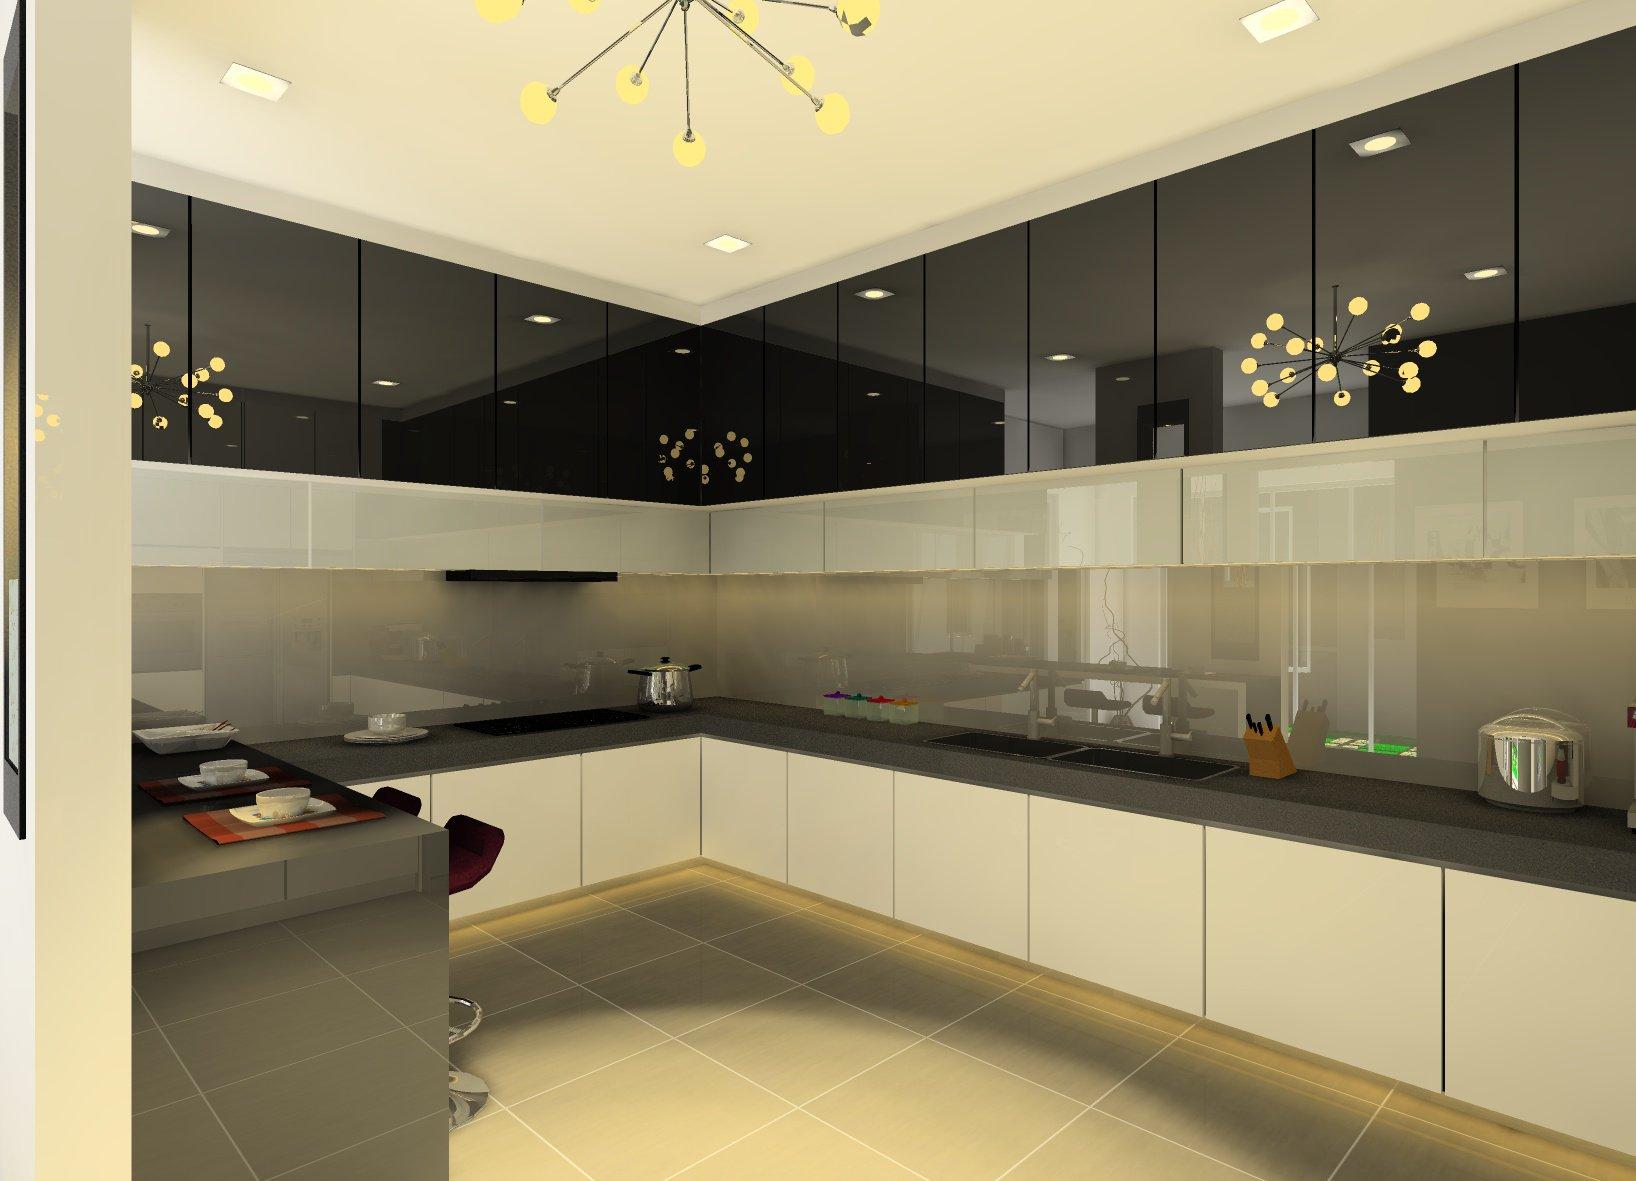 pics photos kitchen modern kitchen design in india indian kitchen with modern look jarul enterprises